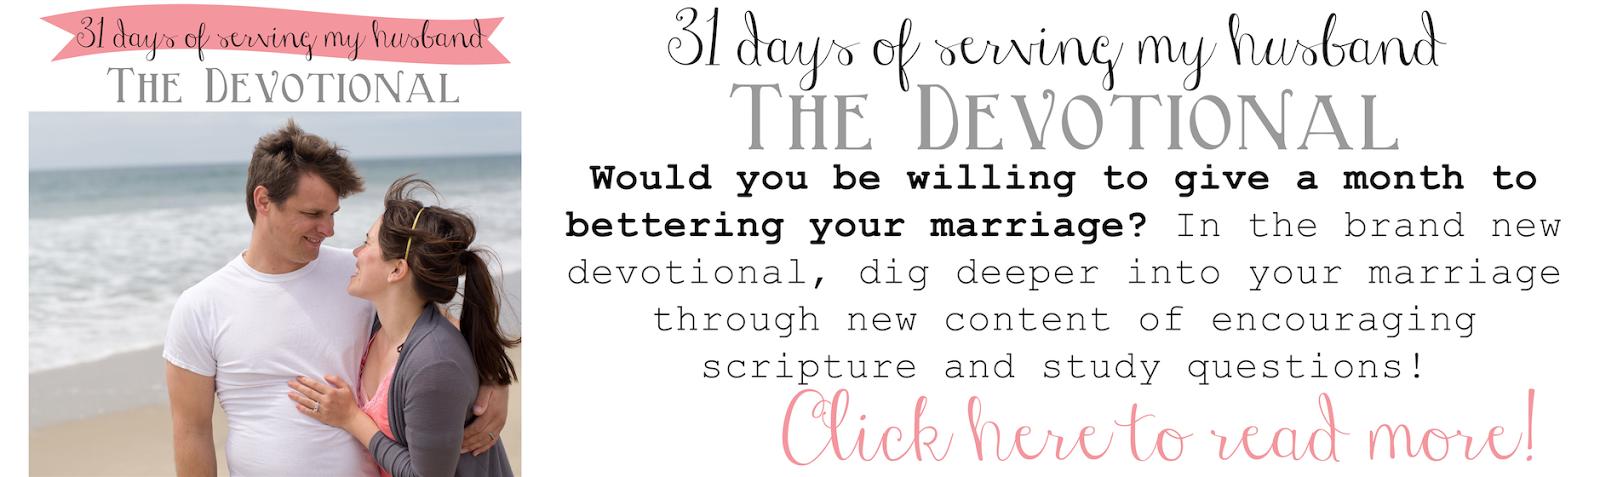 http://www.domesticfashionista.com/2007/09/31-days-of-serving-my-husband-devotional.html